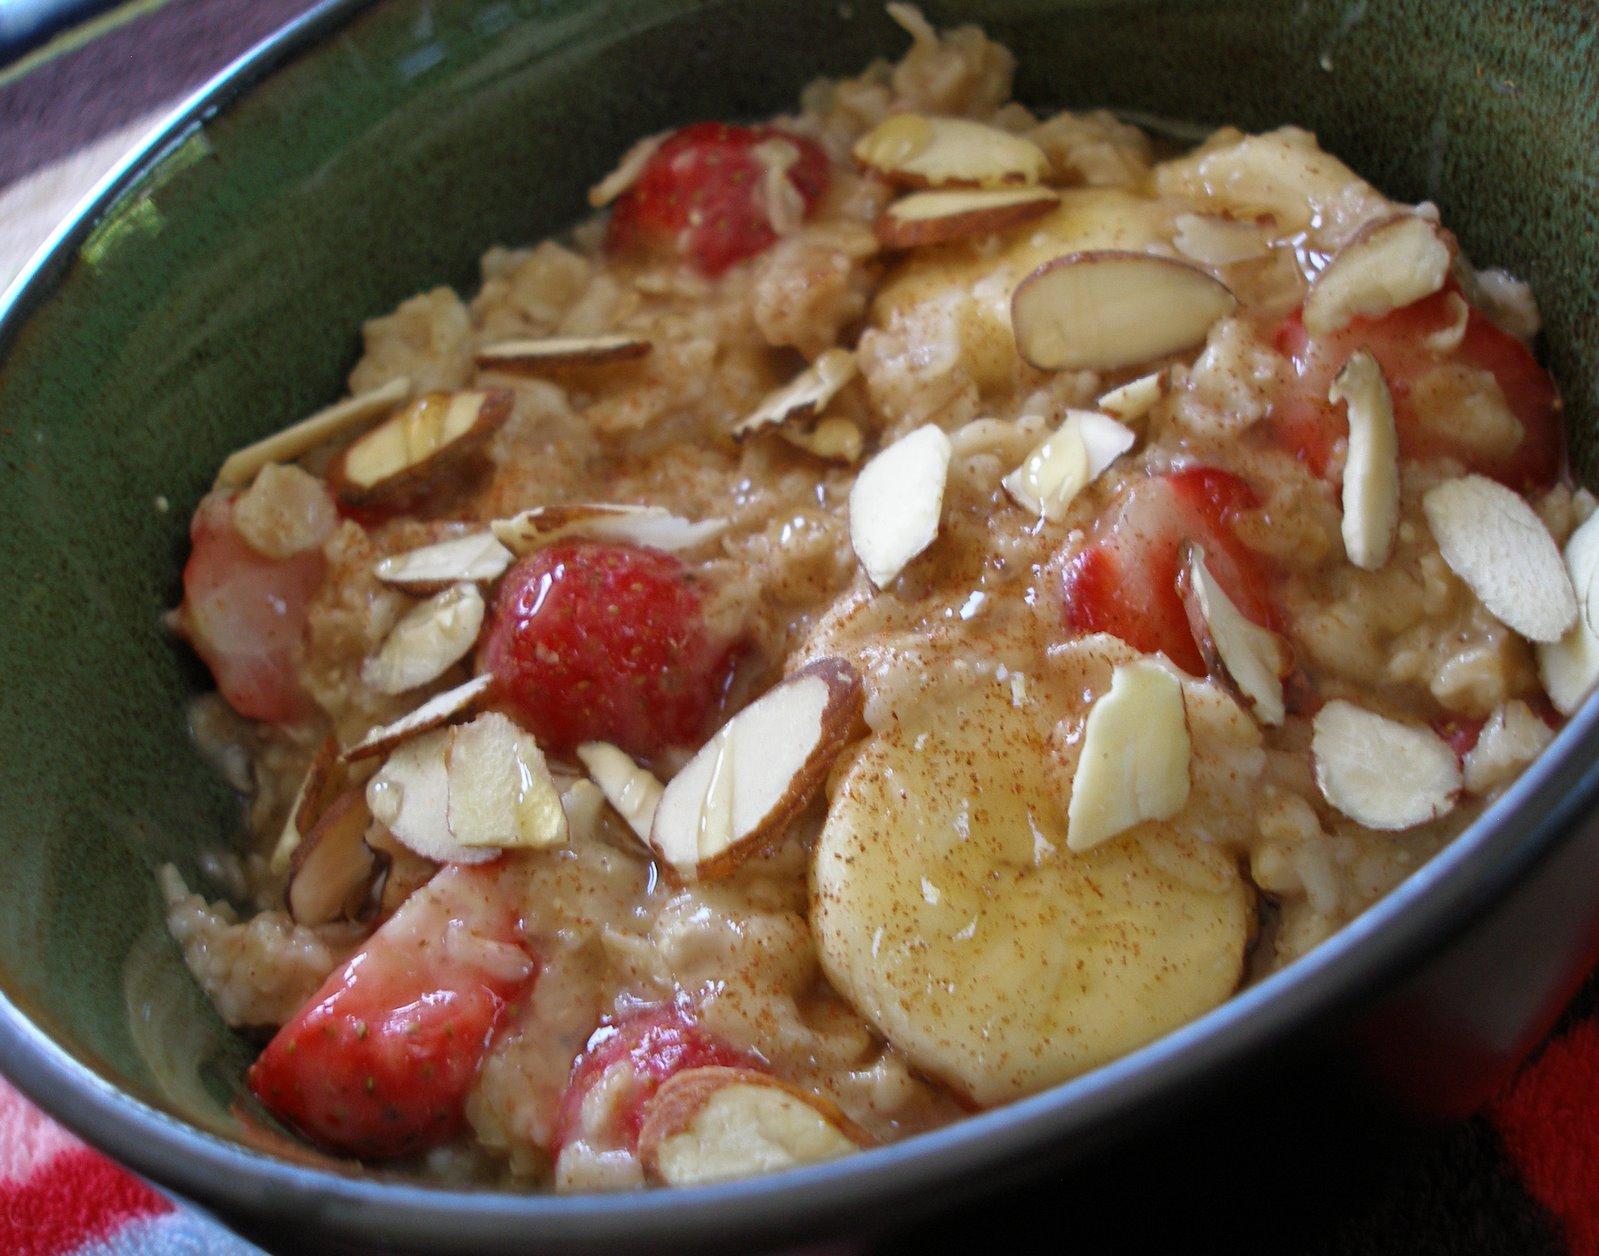 [blog.crop.oatmeal]